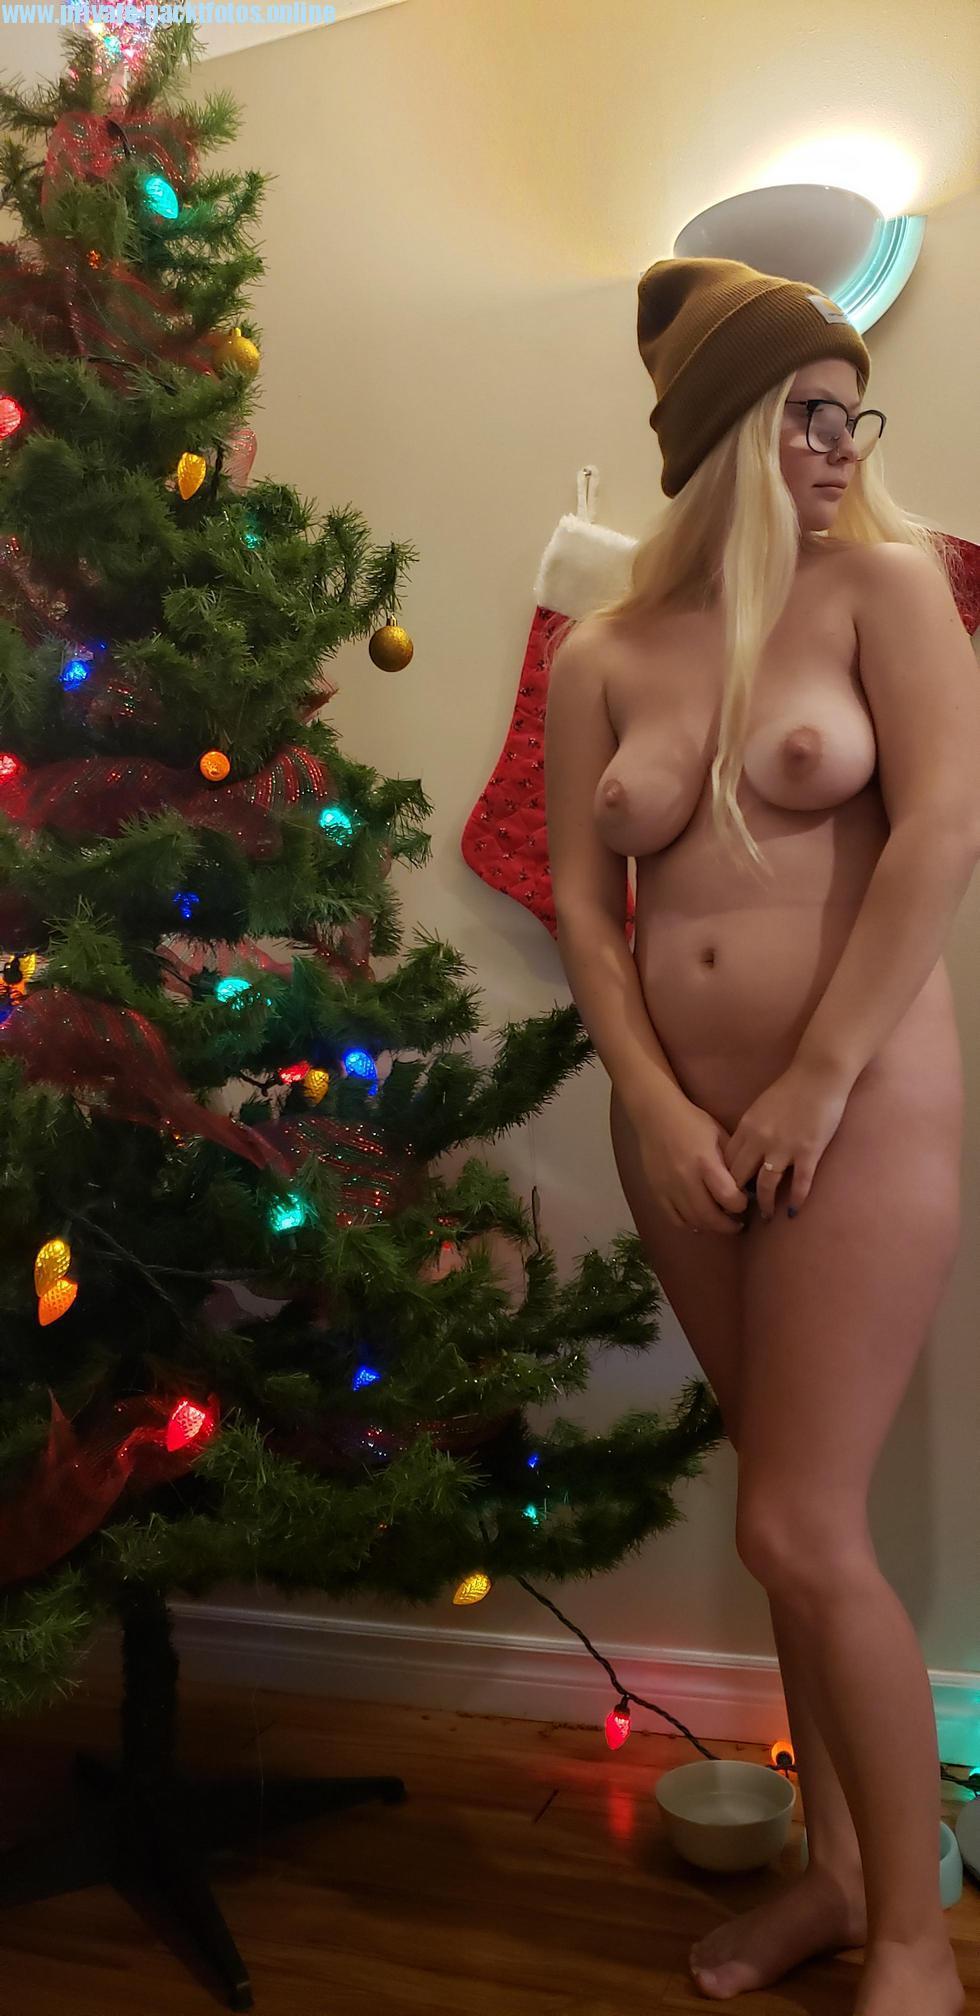 Merry Xmas Nacktfoto